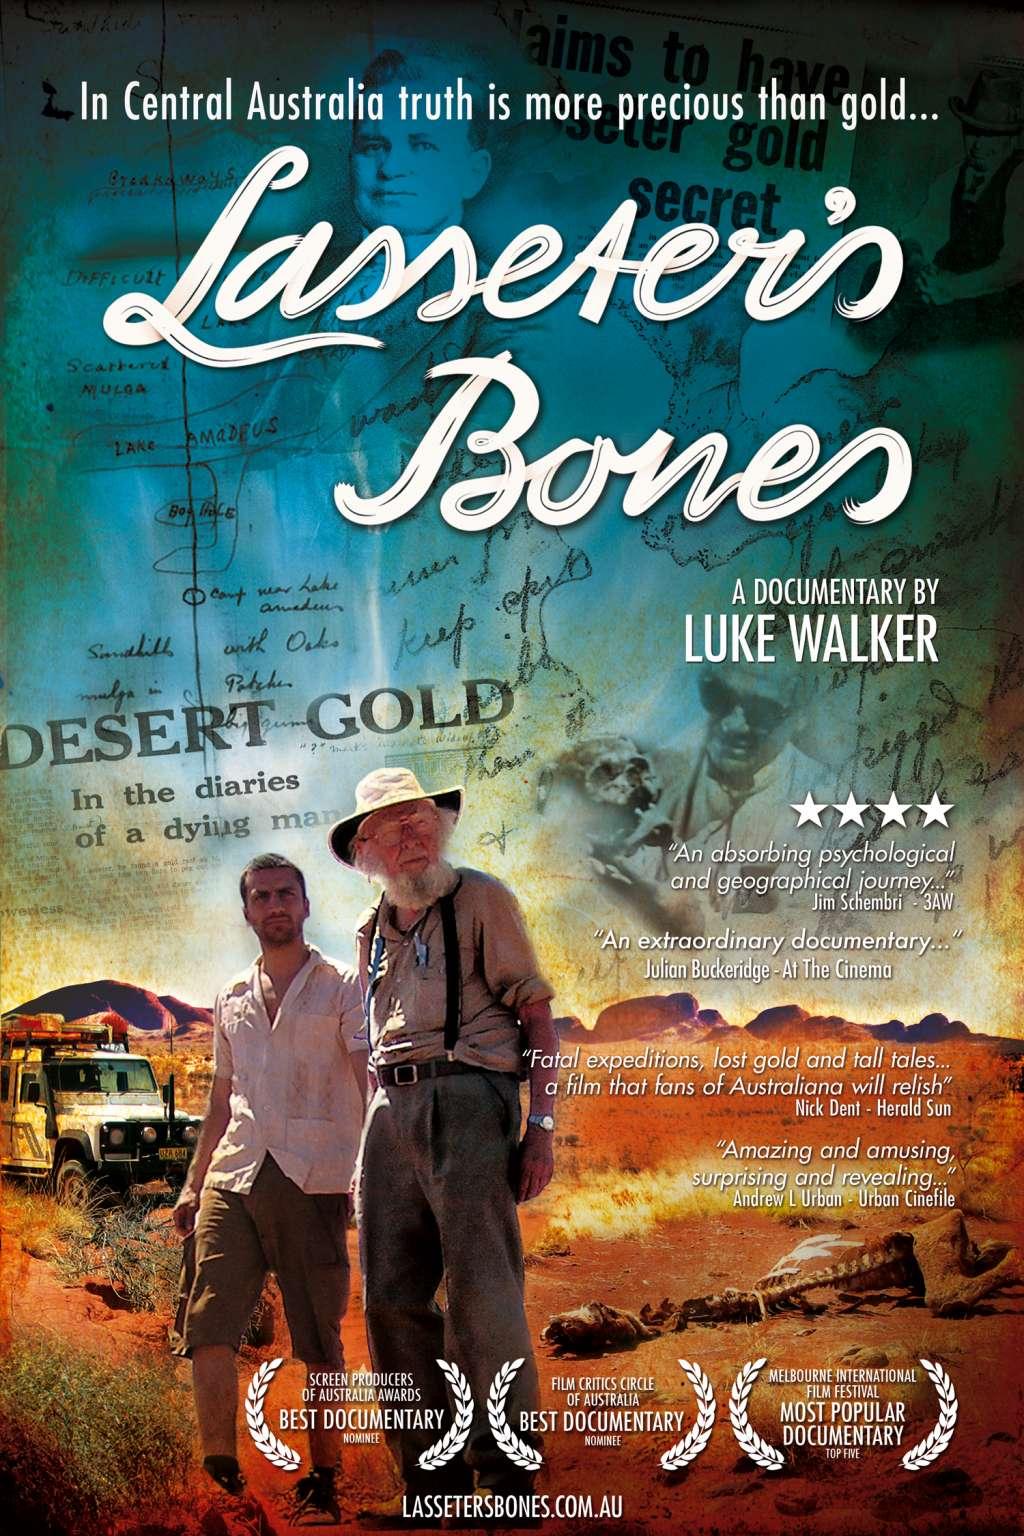 Australia's Lost Gold: The Legend of Lasseter kapak